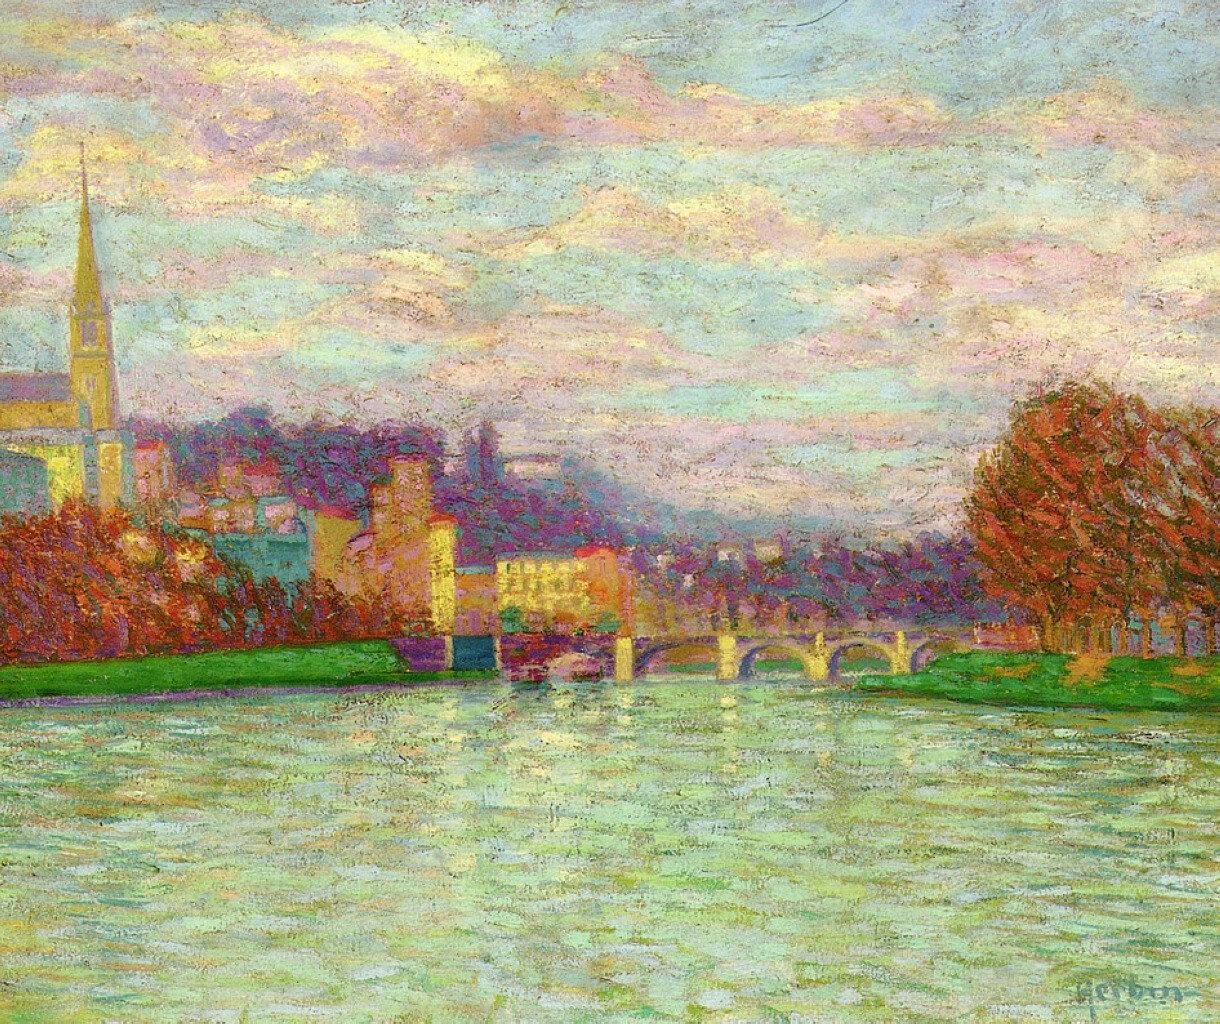 Auguste Herbin - After the Rain at La Roche-Guyon, 1906.jpeg